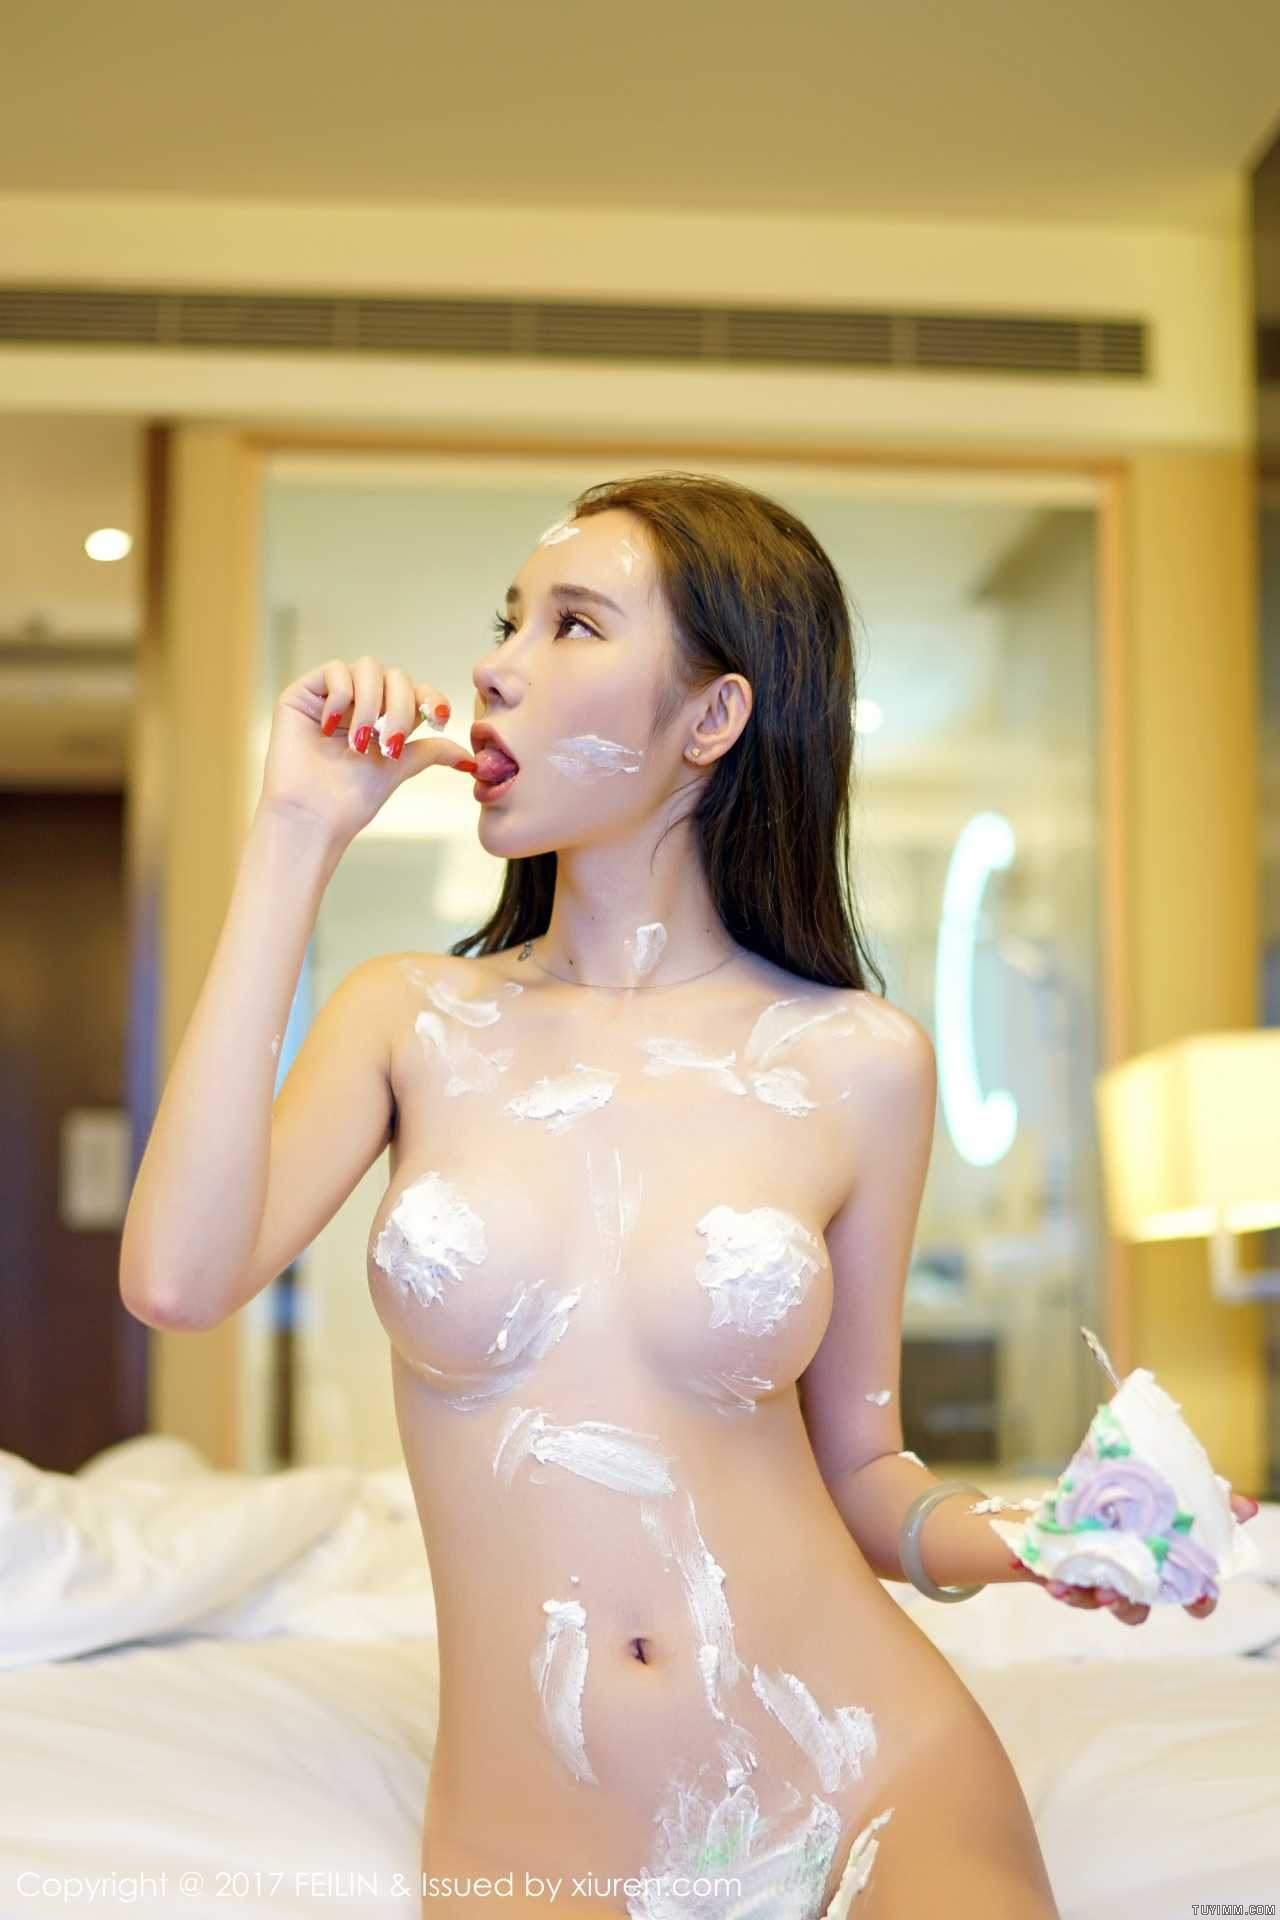 FEILIN嗲囡囡 2017.03.13 VOL.080 萌琪琪Irene-第12张图片-哔哔娱乐网